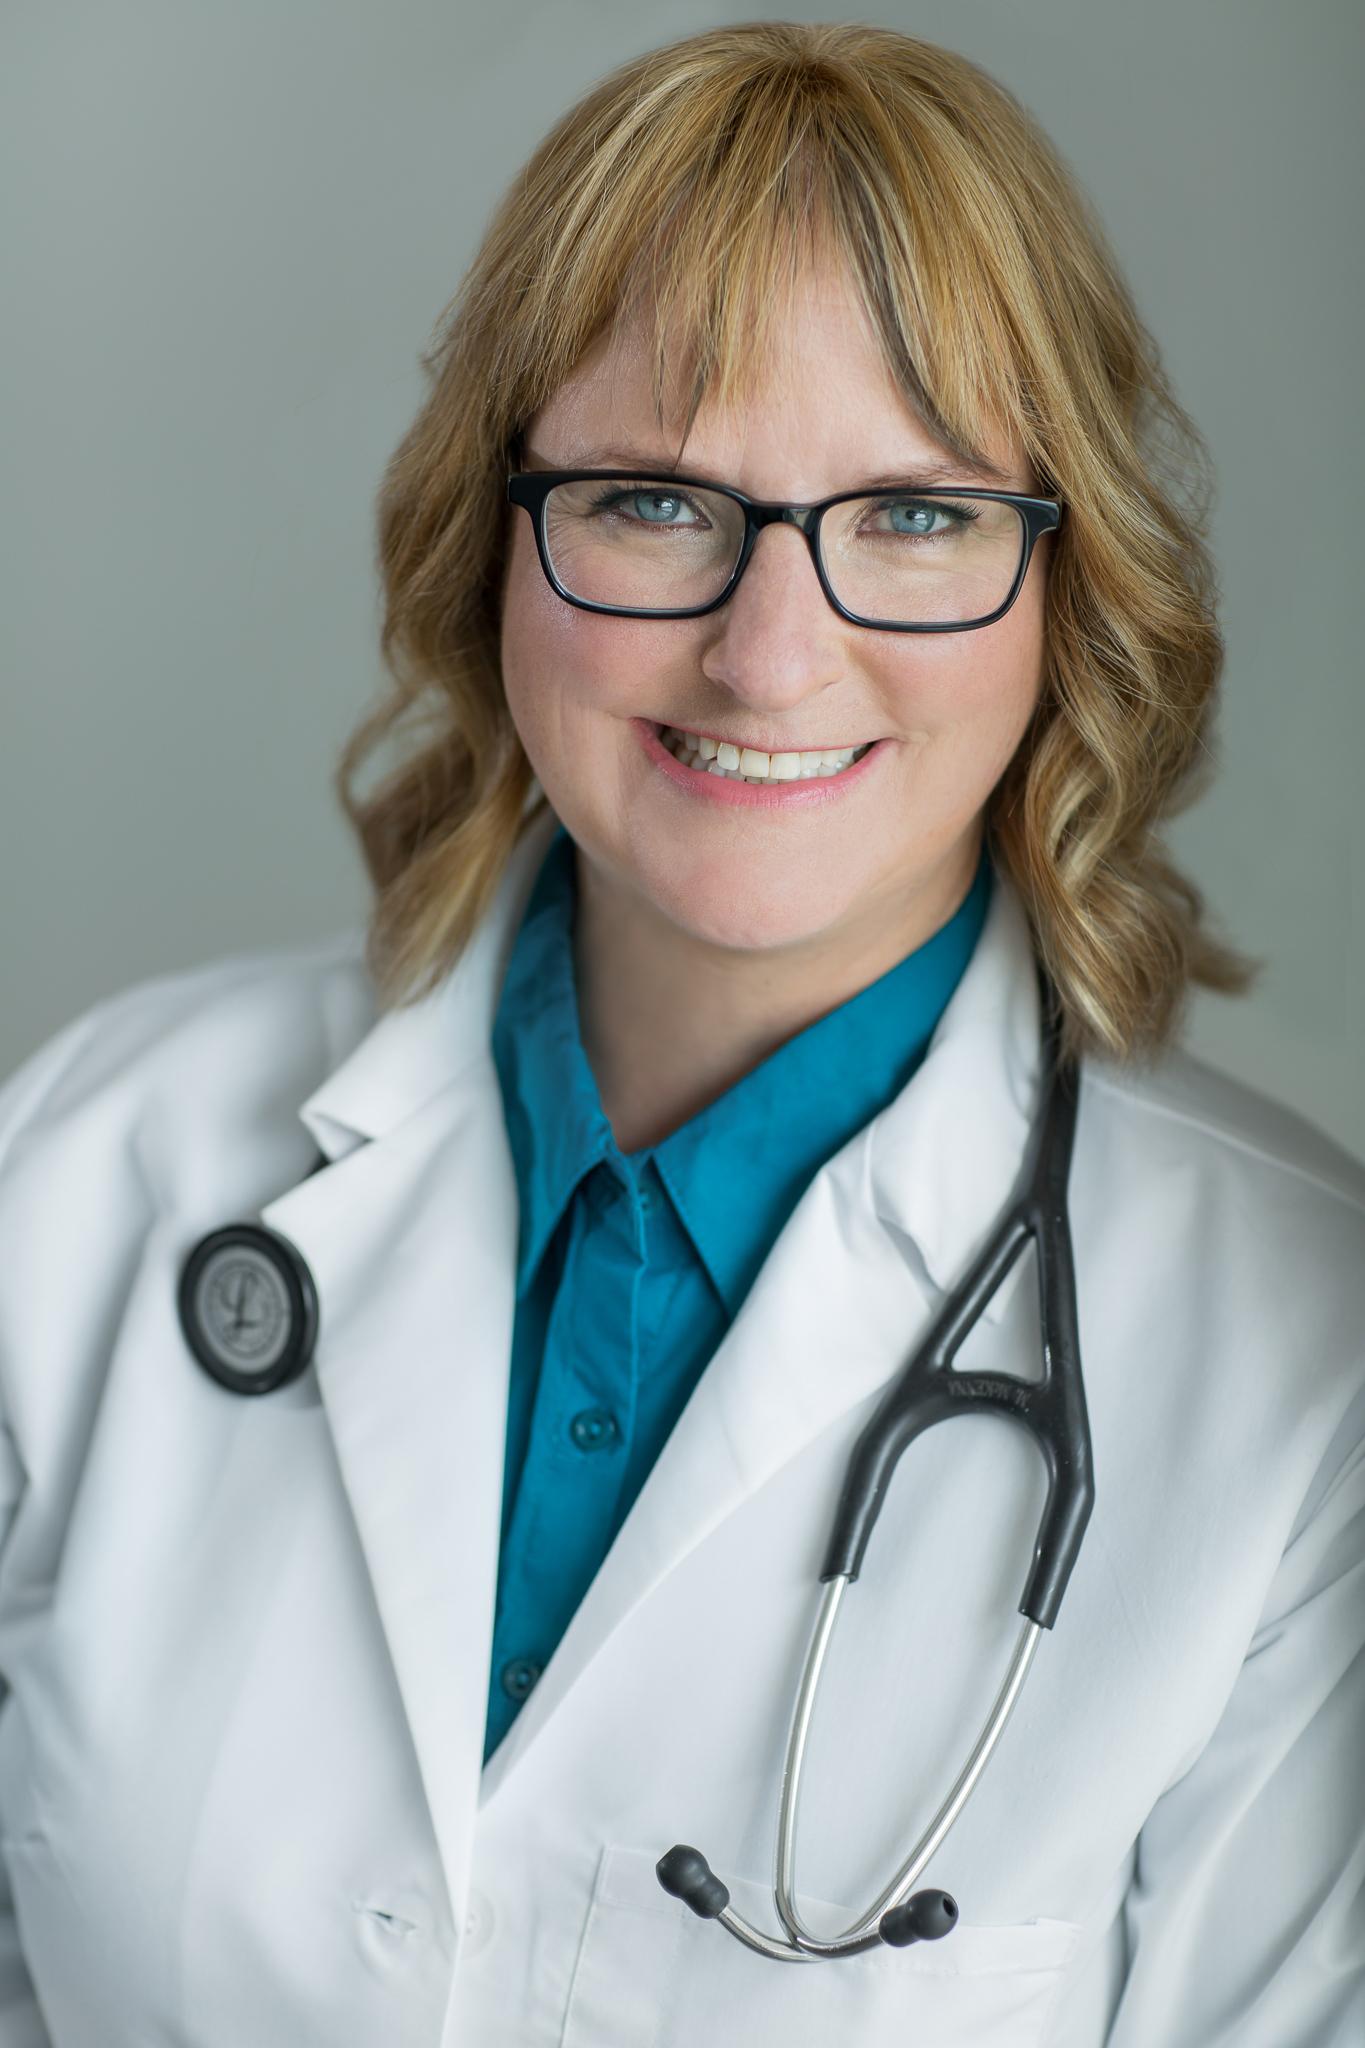 A healthcare professional headshot